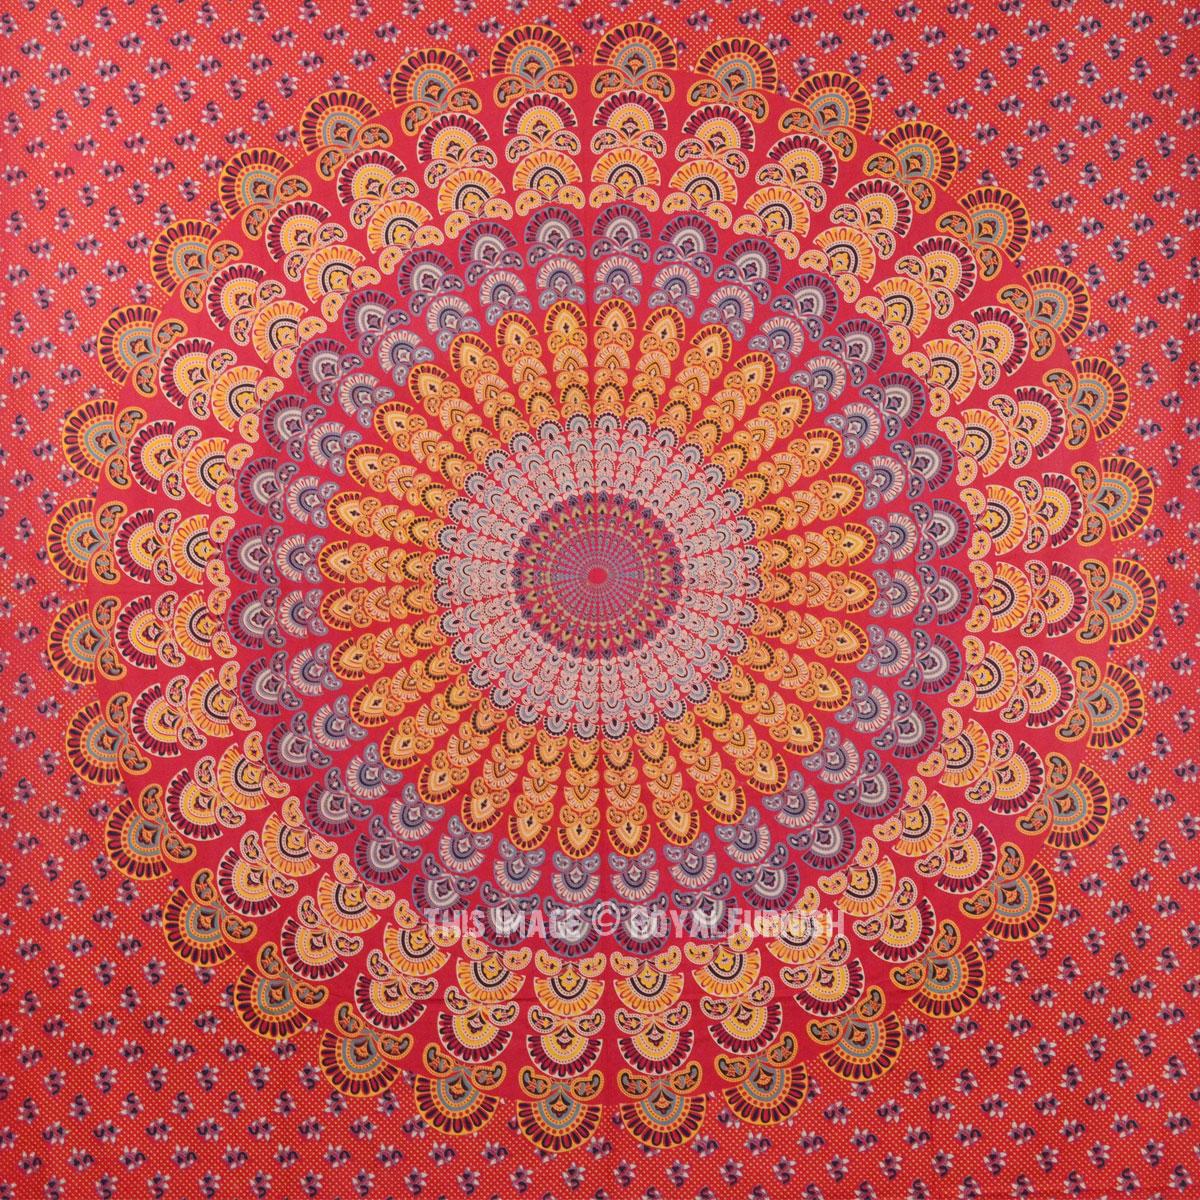 Red Multi Indian Medallion Mandala Wall Tapestry, Hippie Indian Throw - RoyalFurnish.com